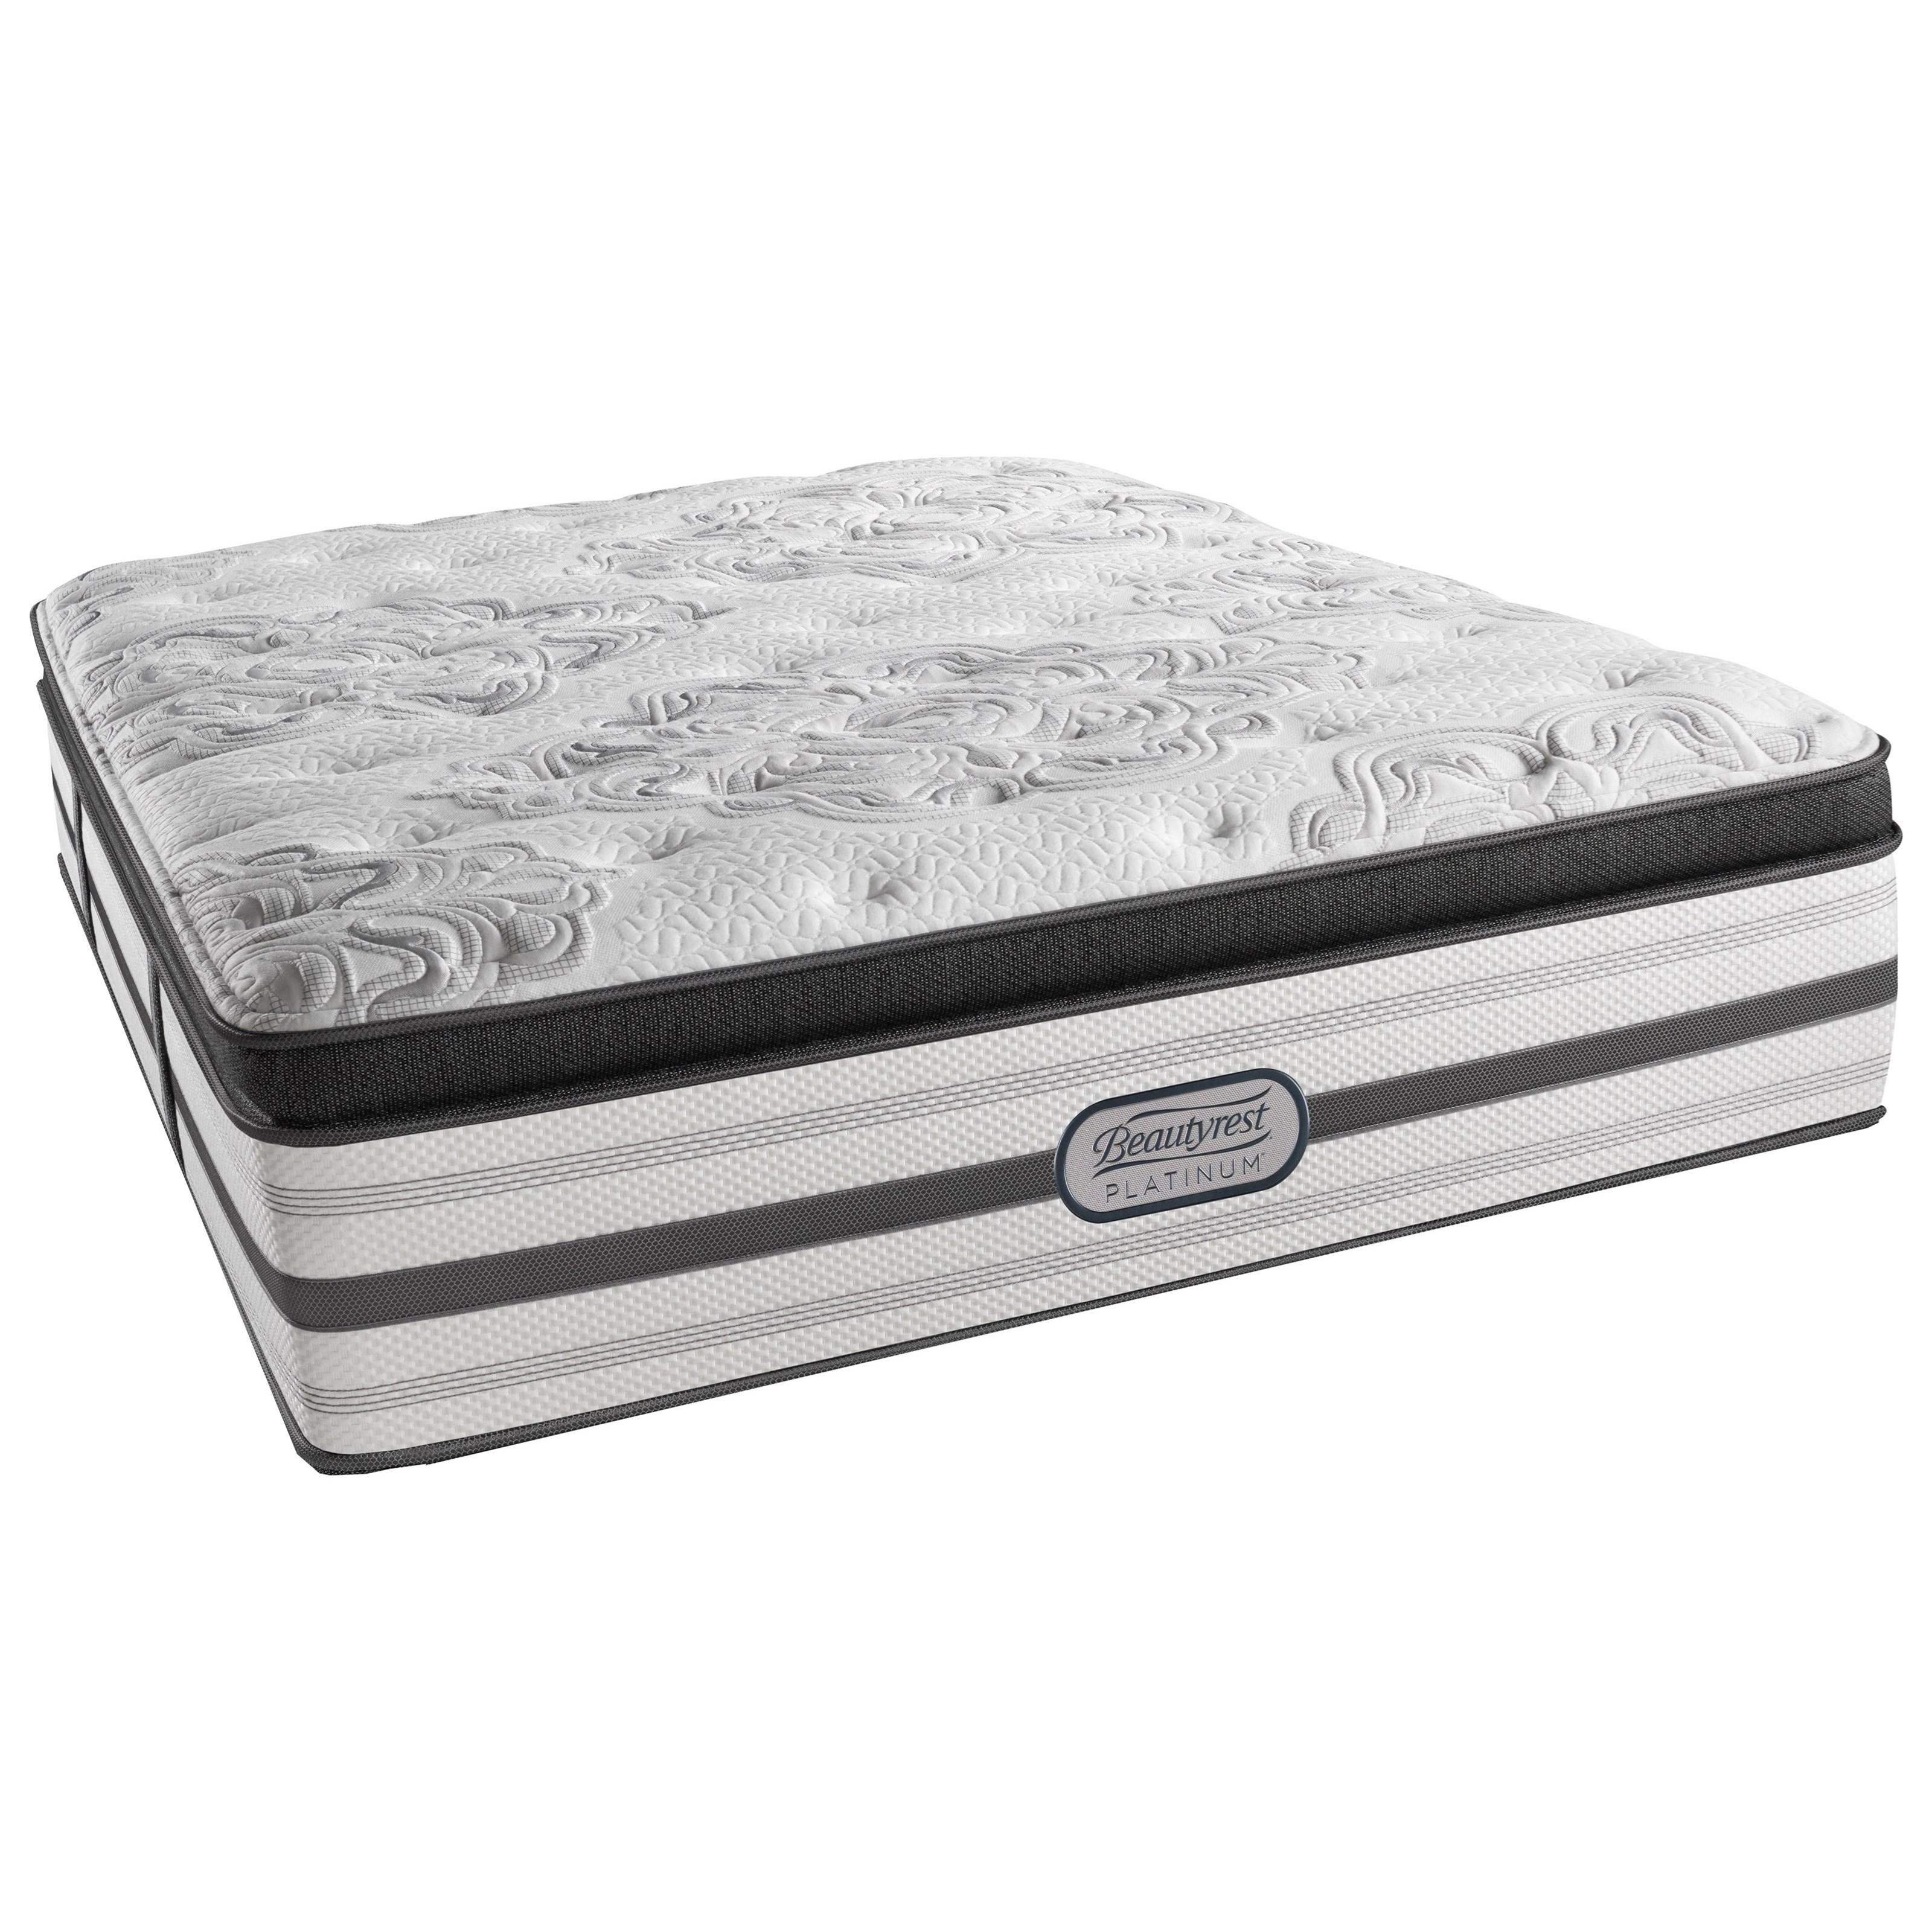 "Beautyrest Platinum Katherine King Plush Box PT 16 1/2"" Mattress - Item Number: LV4PLBT-K"